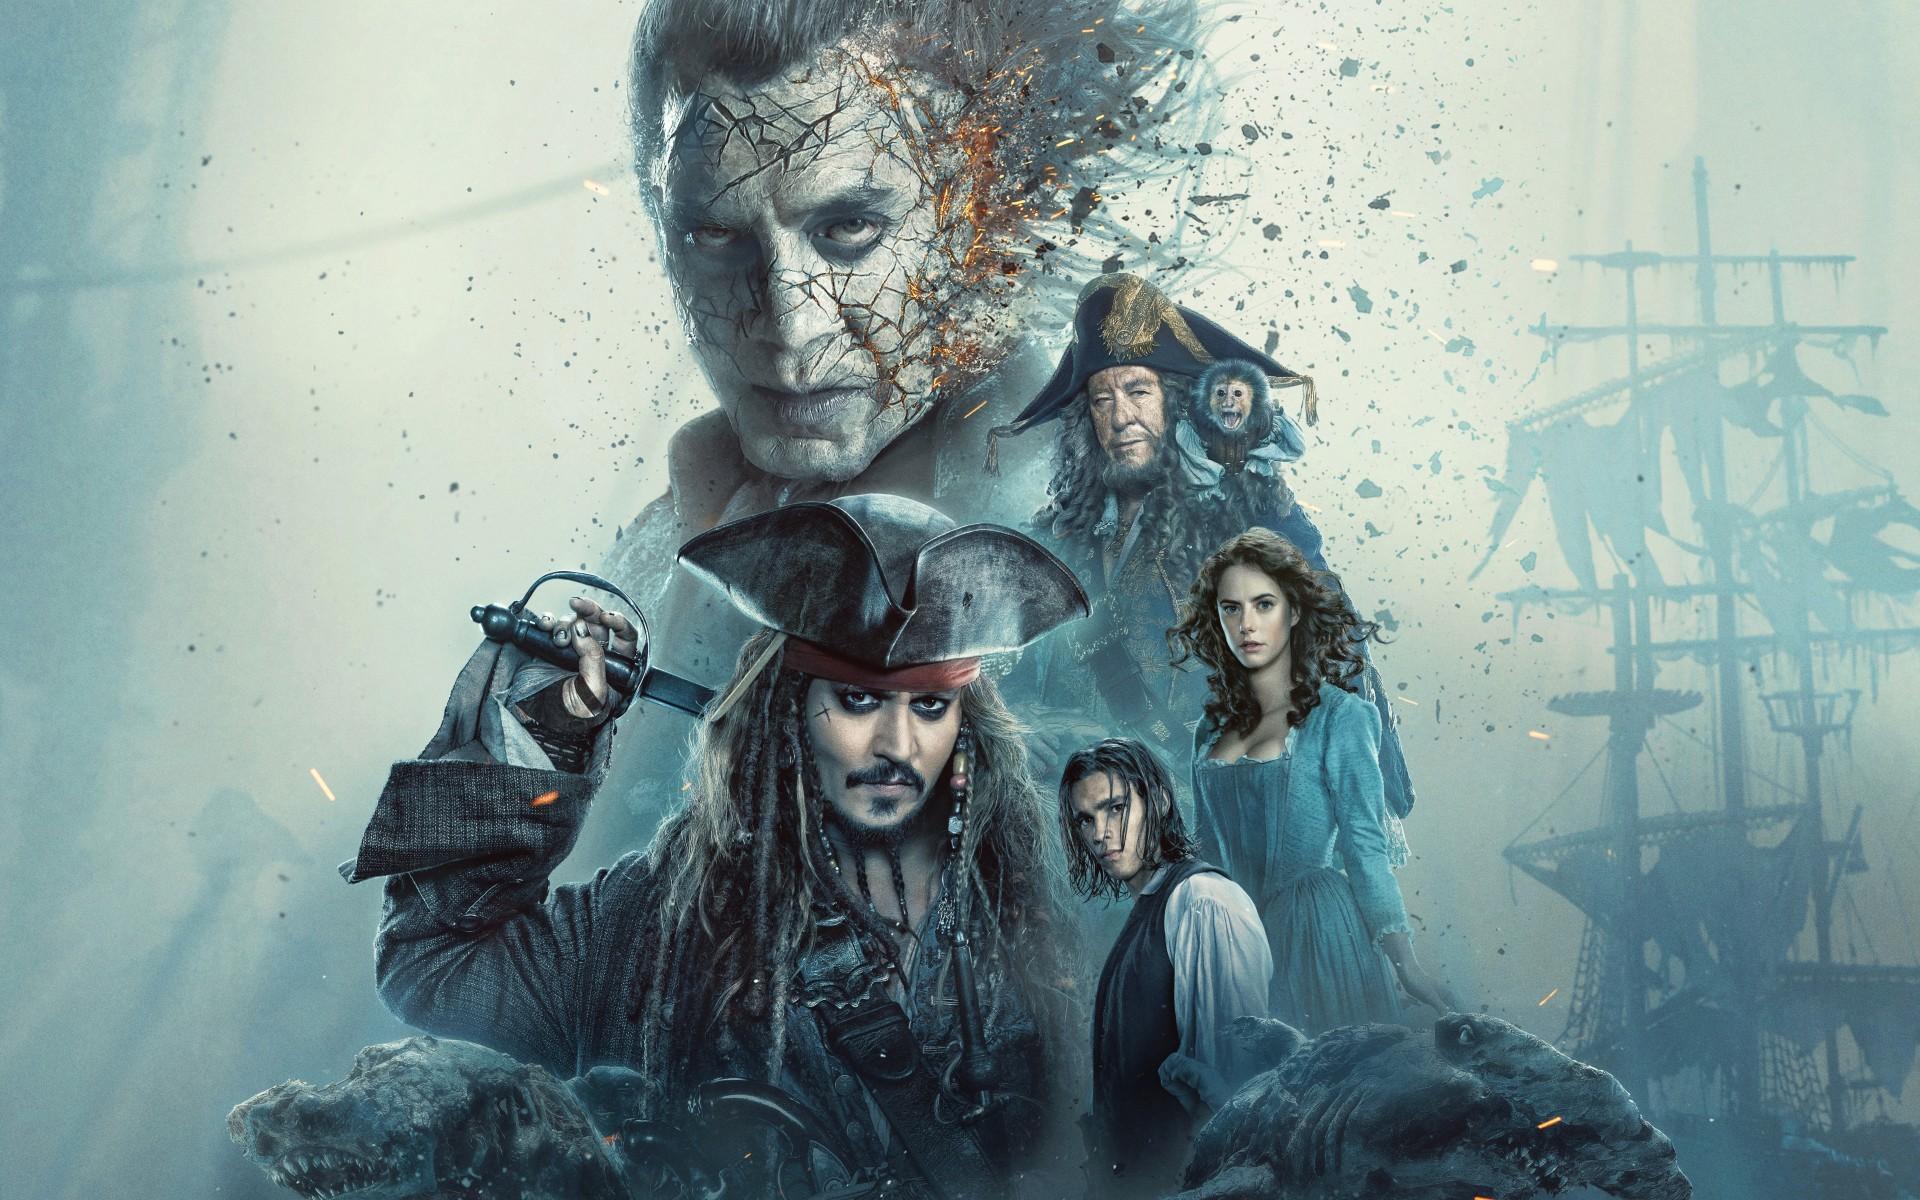 Movies / Pirates of the Caribbean: Salazar's Revenge Wallpaper